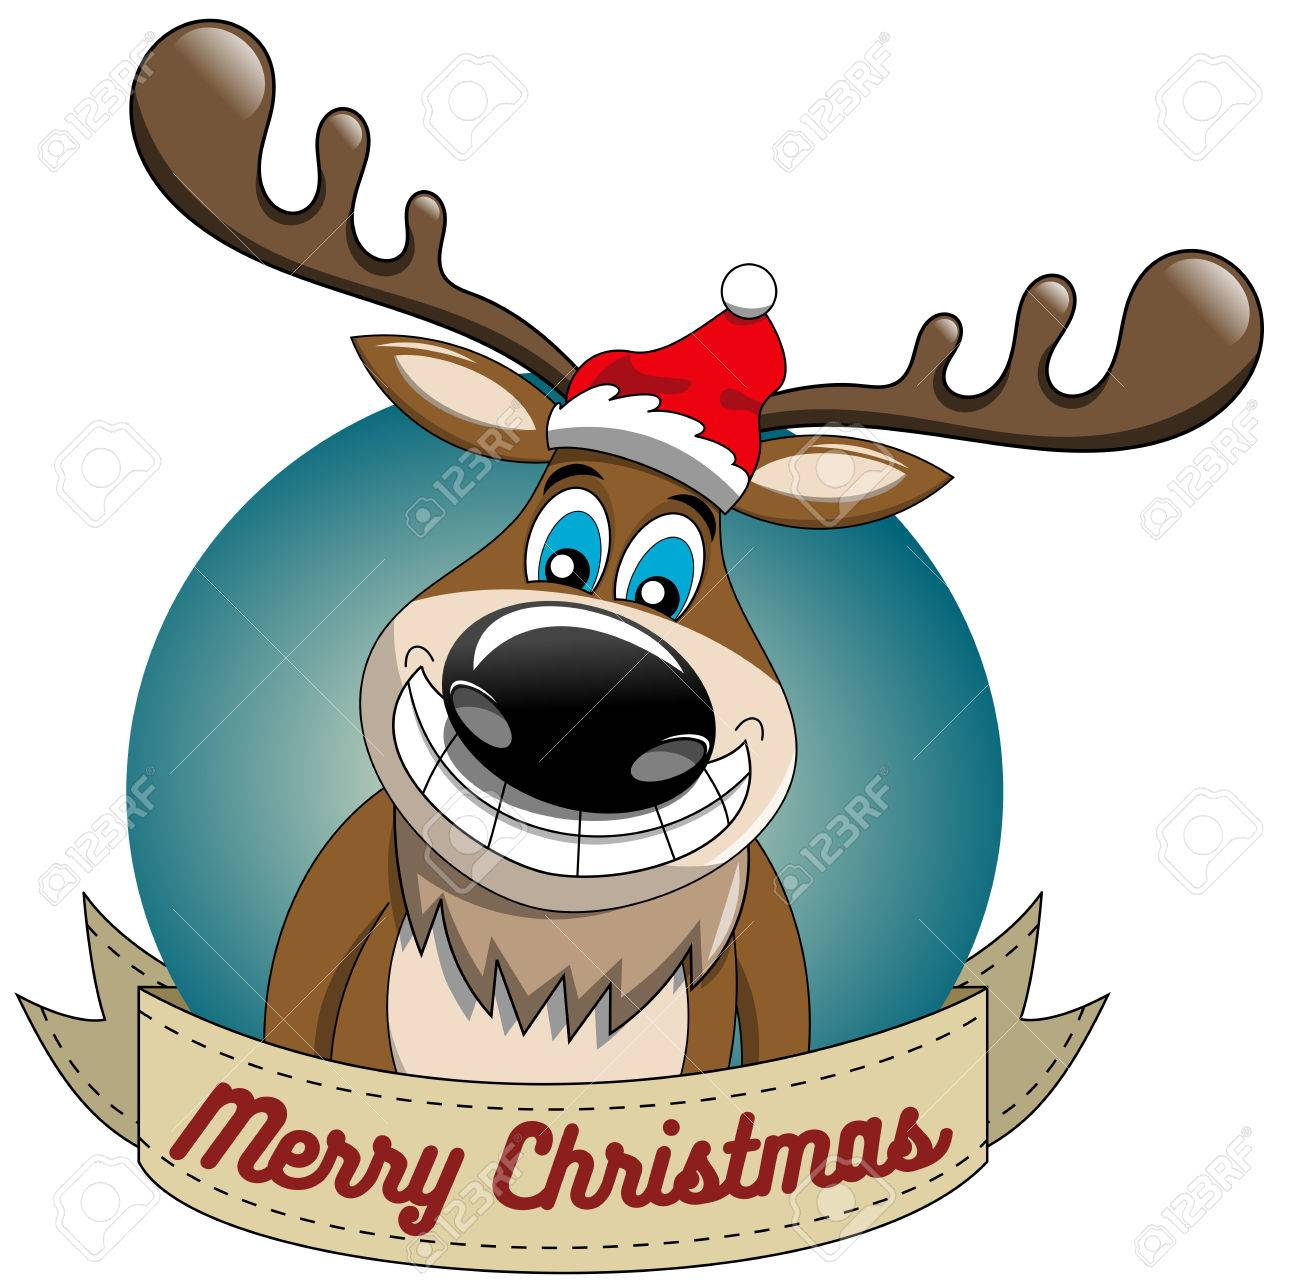 Weihnachten Funny.Funny Reindeer Cartoon Wishing Merry Christmas In Round Frame